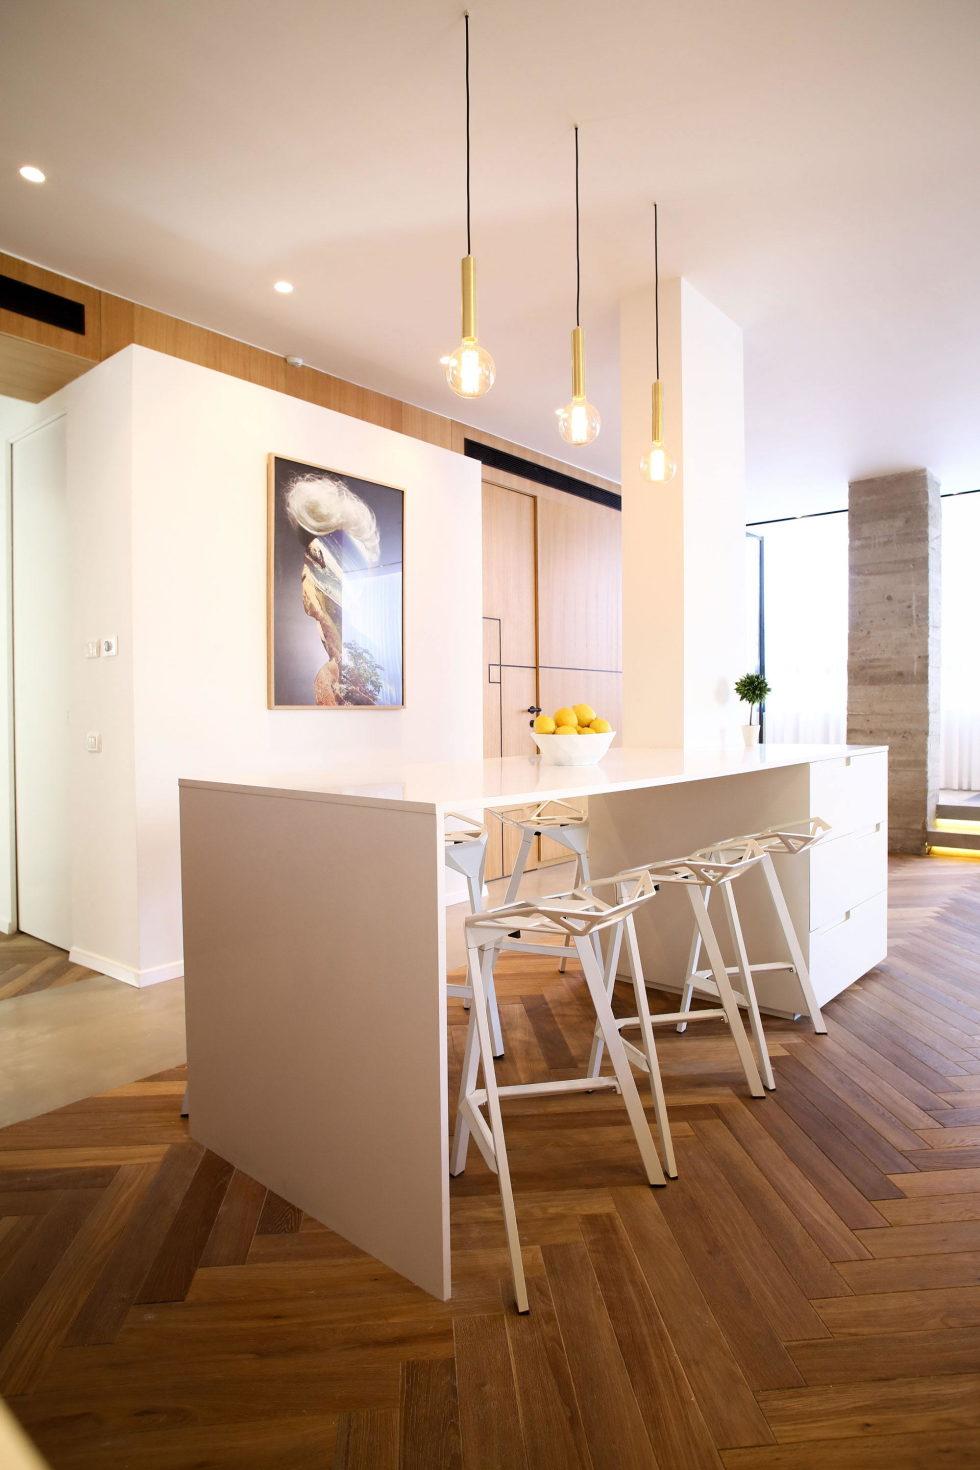 Gallery Of Cheap Apartments Tel Aviv Idea Tlv Gordon 8 2 The Apartment In Tel Aviv 15